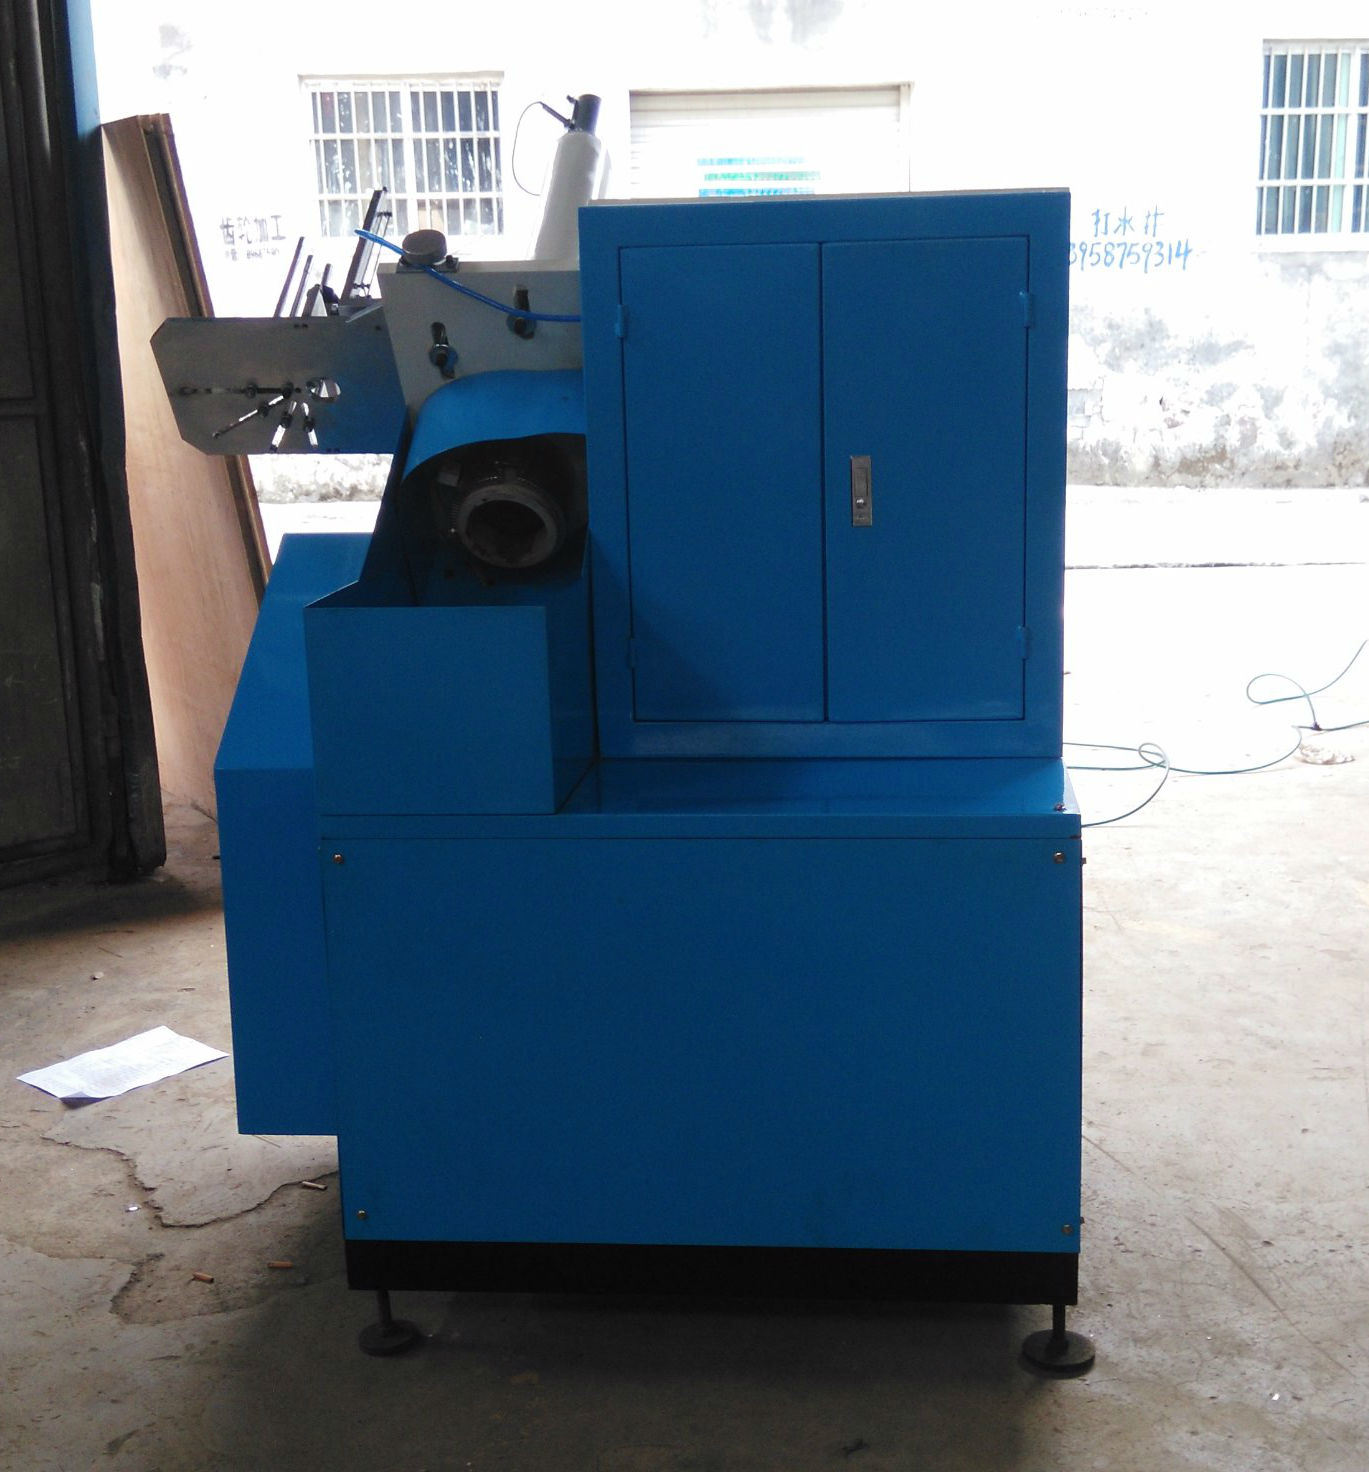 Paper Cake Cup Making Machine, Cake Tray Machine, Cake Cup Forming Machine, Automatic Cake Tray Making Machine